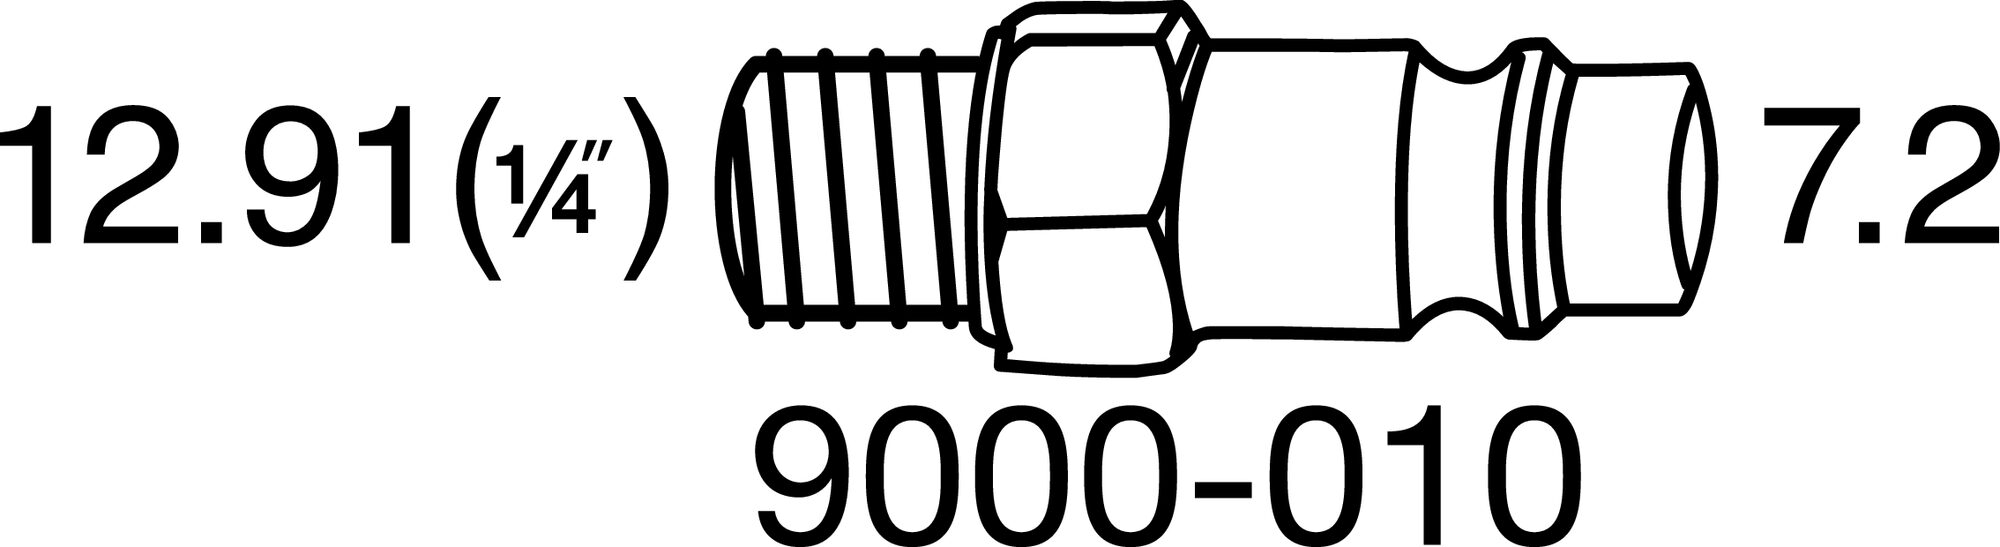 HAZET Stabschleifer ∙ gerade ∙ lang 9032LG-1